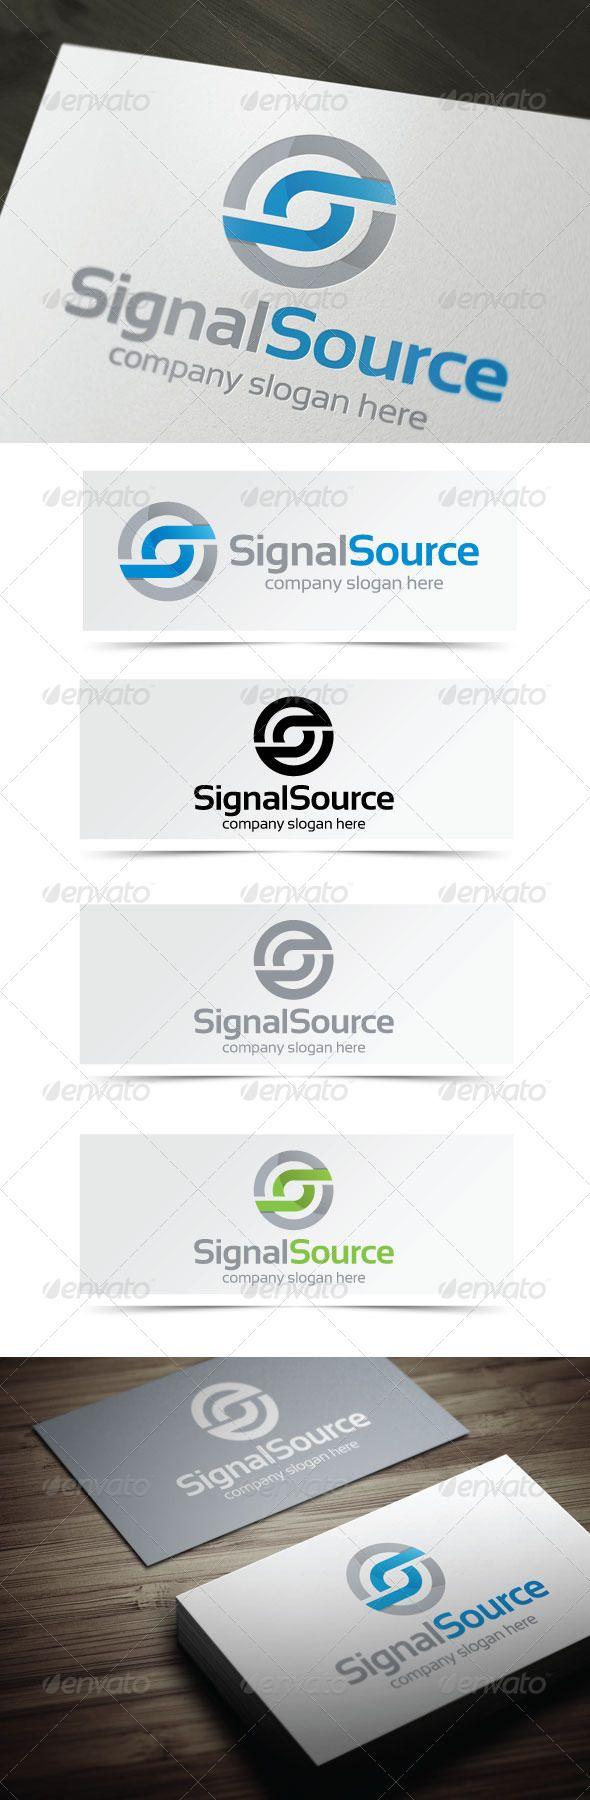 Signal Source Logo templates, Tree logo design, Circle